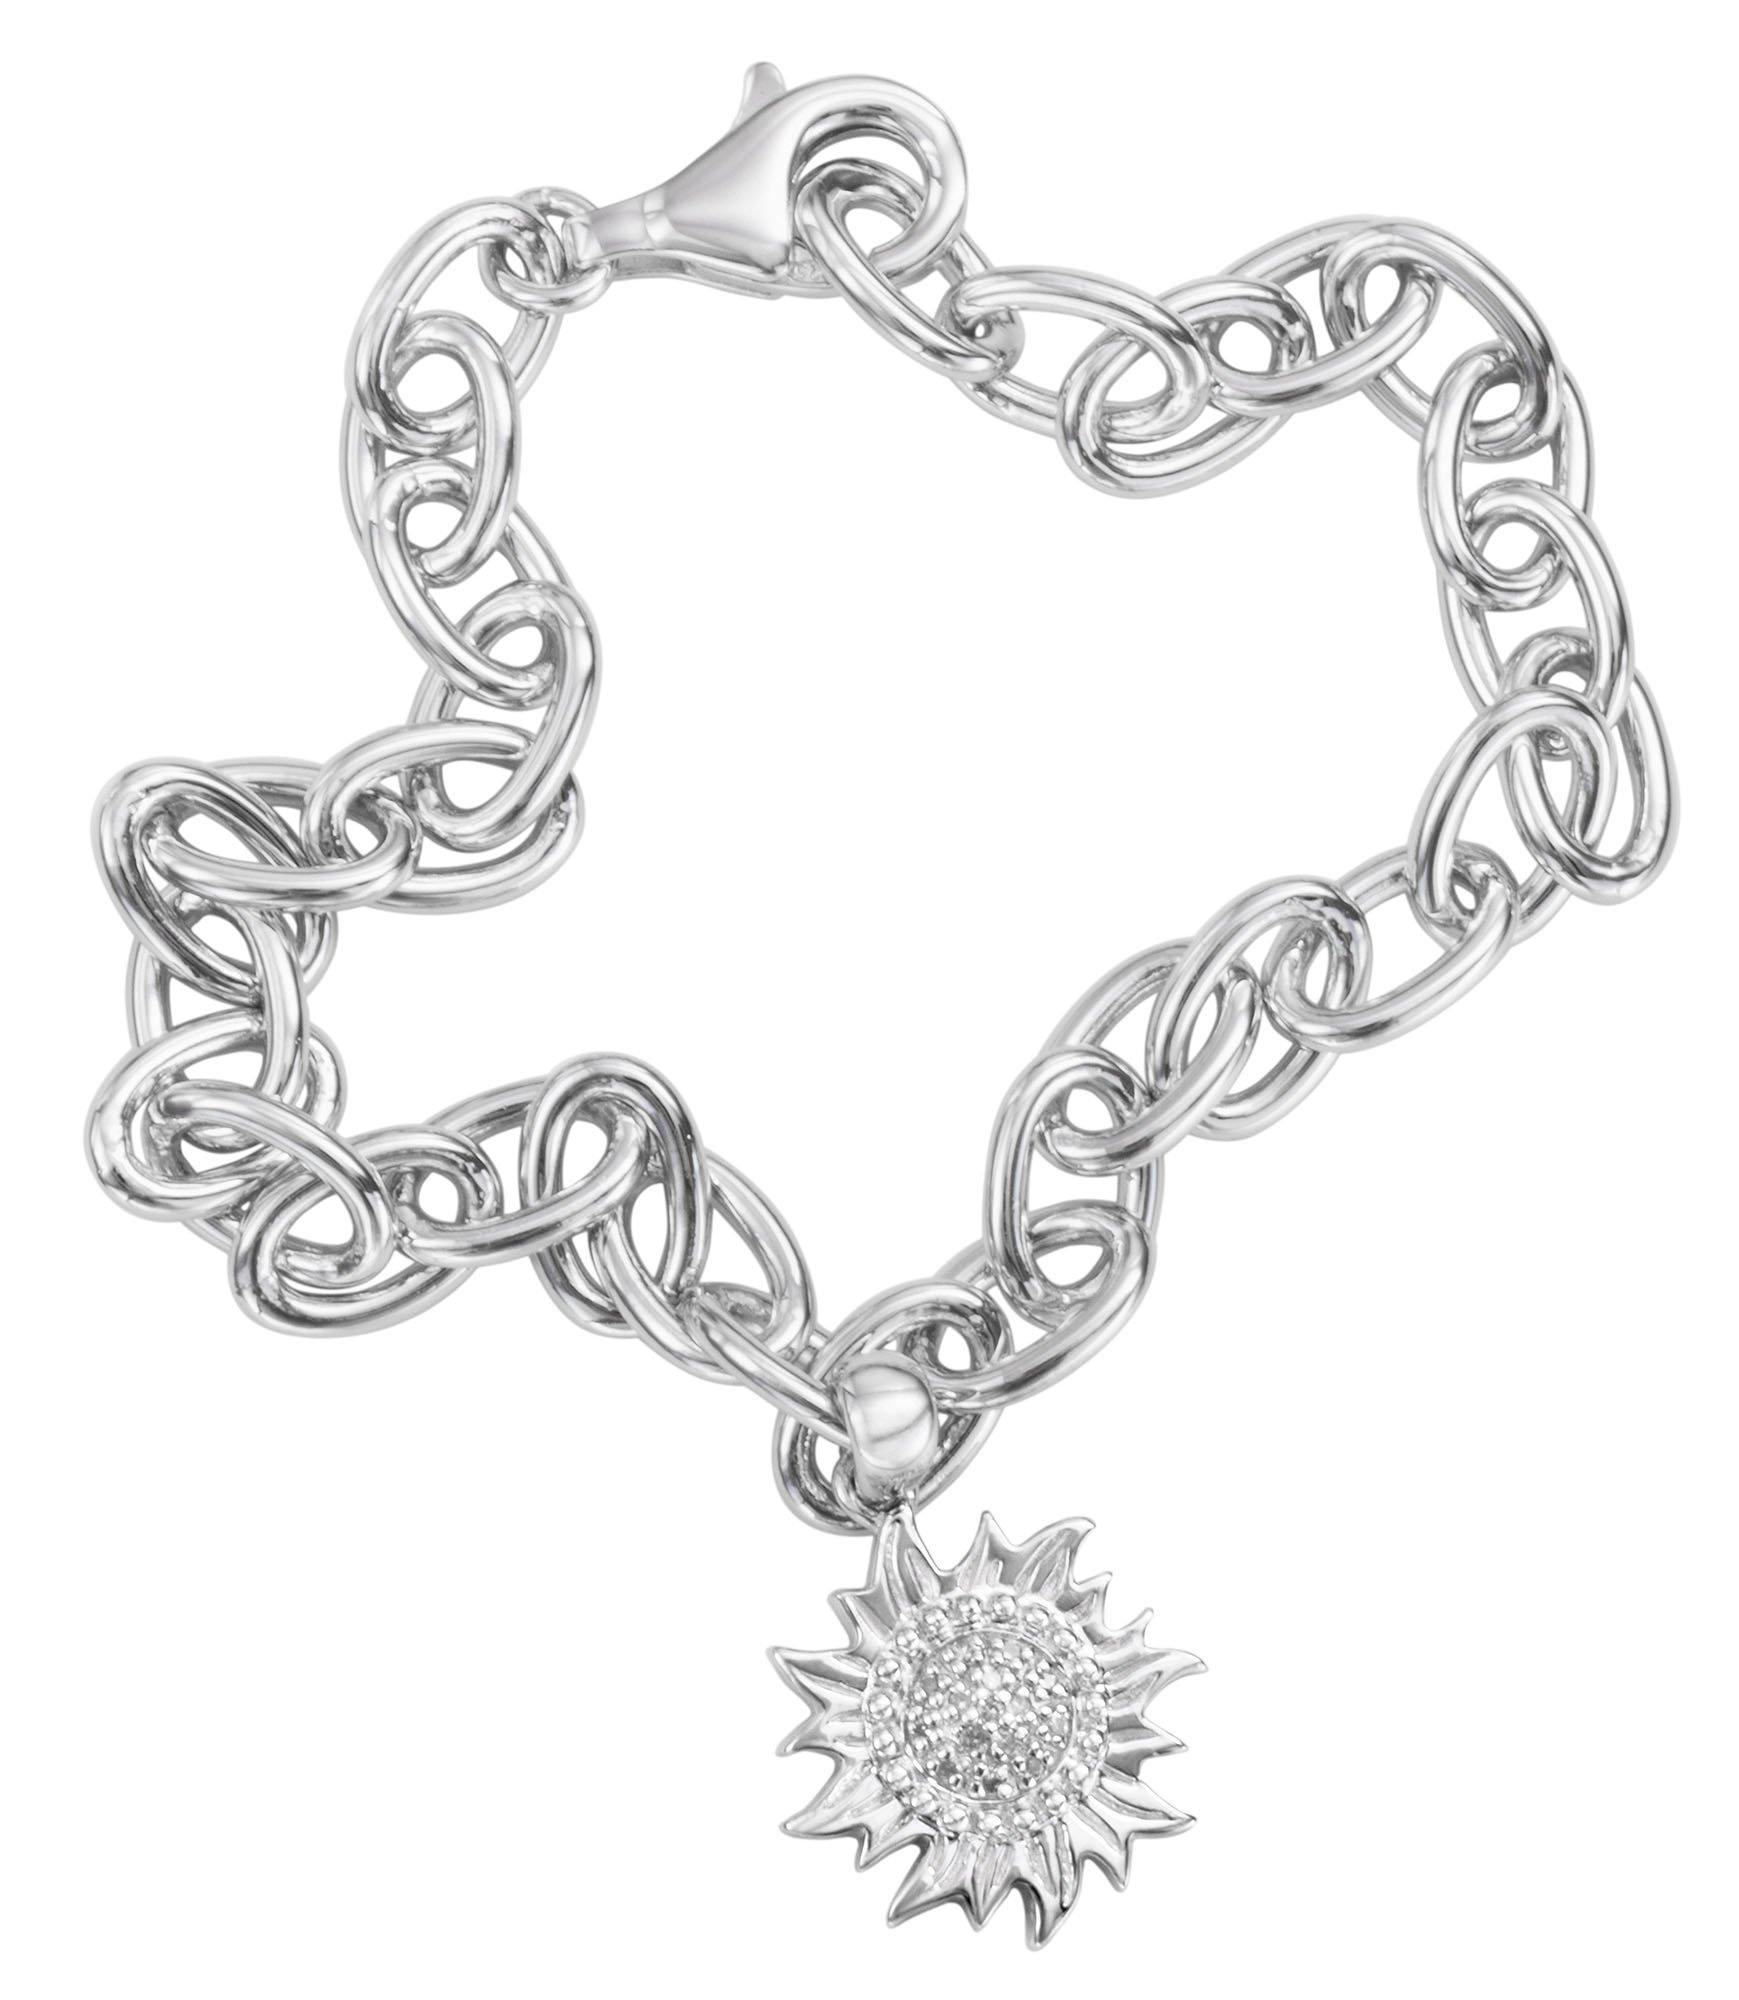 Genuine Solid Sterling Silver .925 Puerto Rico Sun Link Charm Bracelet